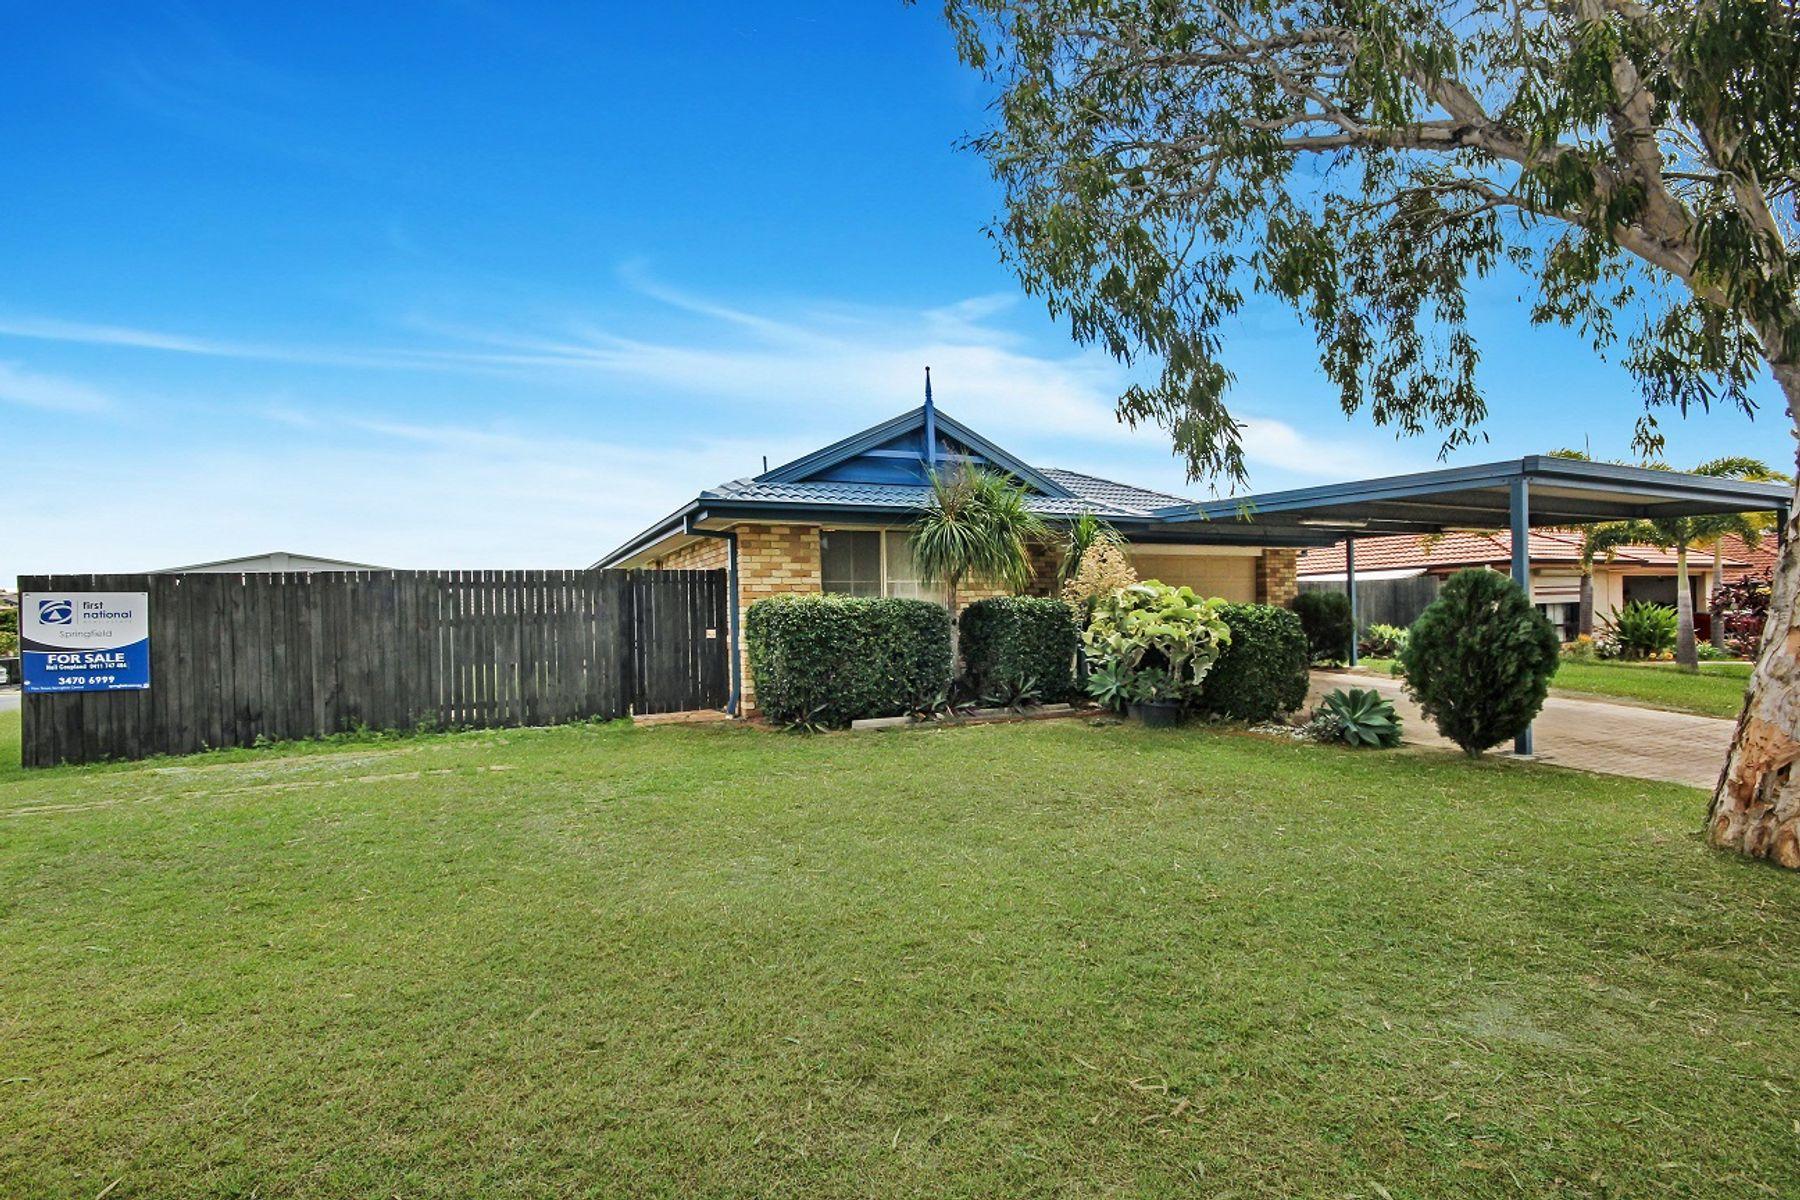 14 Clifford Court, Goodna, QLD 4300